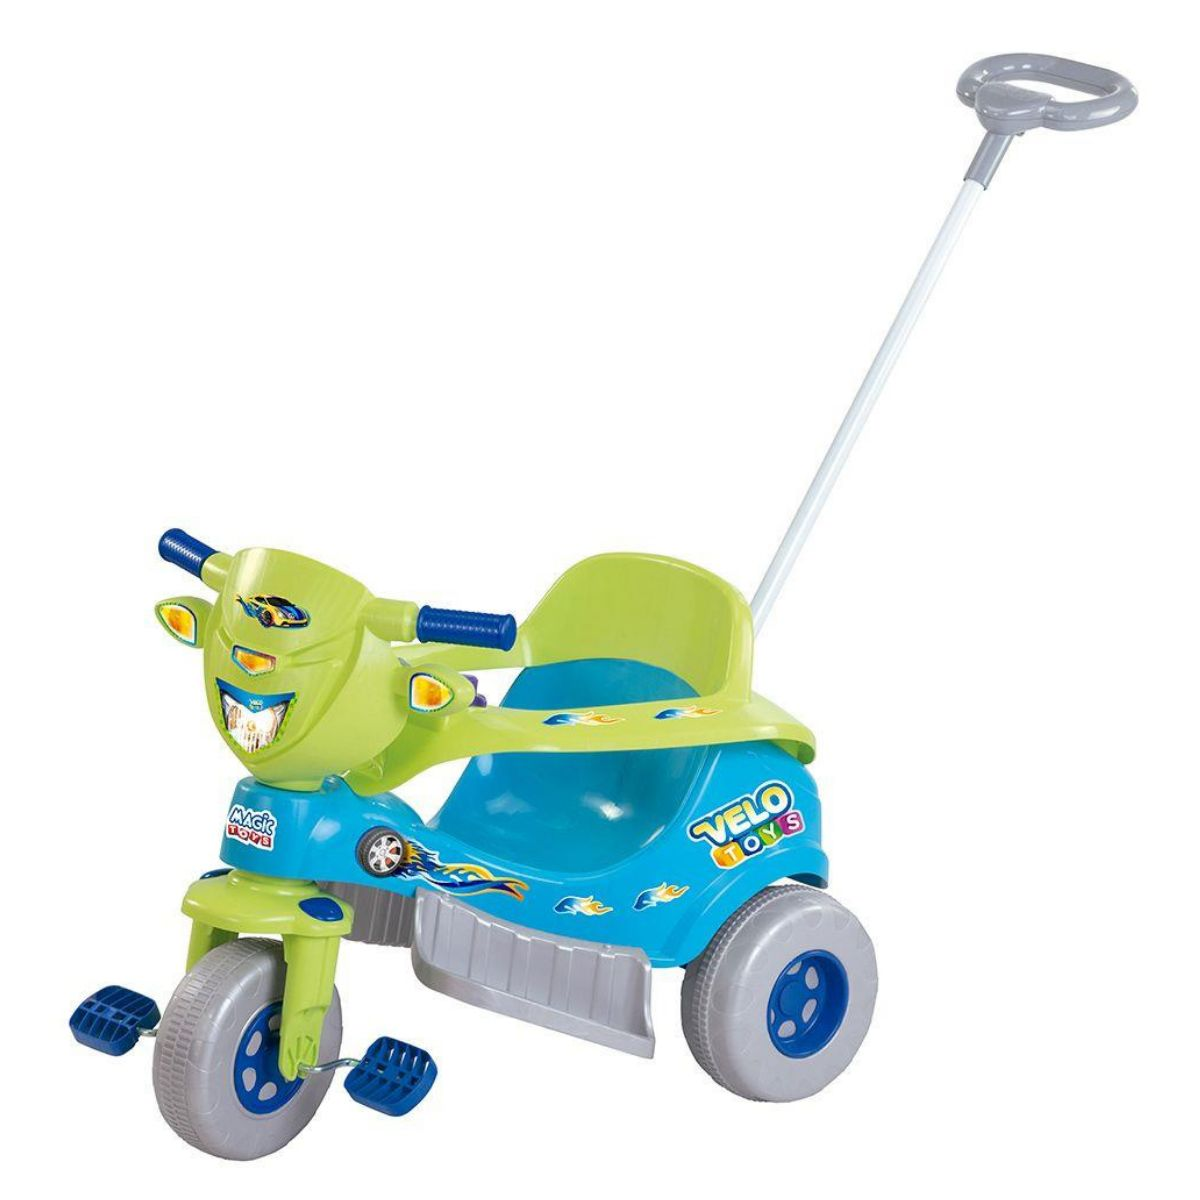 Triciclo Infantil Grande Velo Toys Azul c/Capacete - Magic Toys 3720